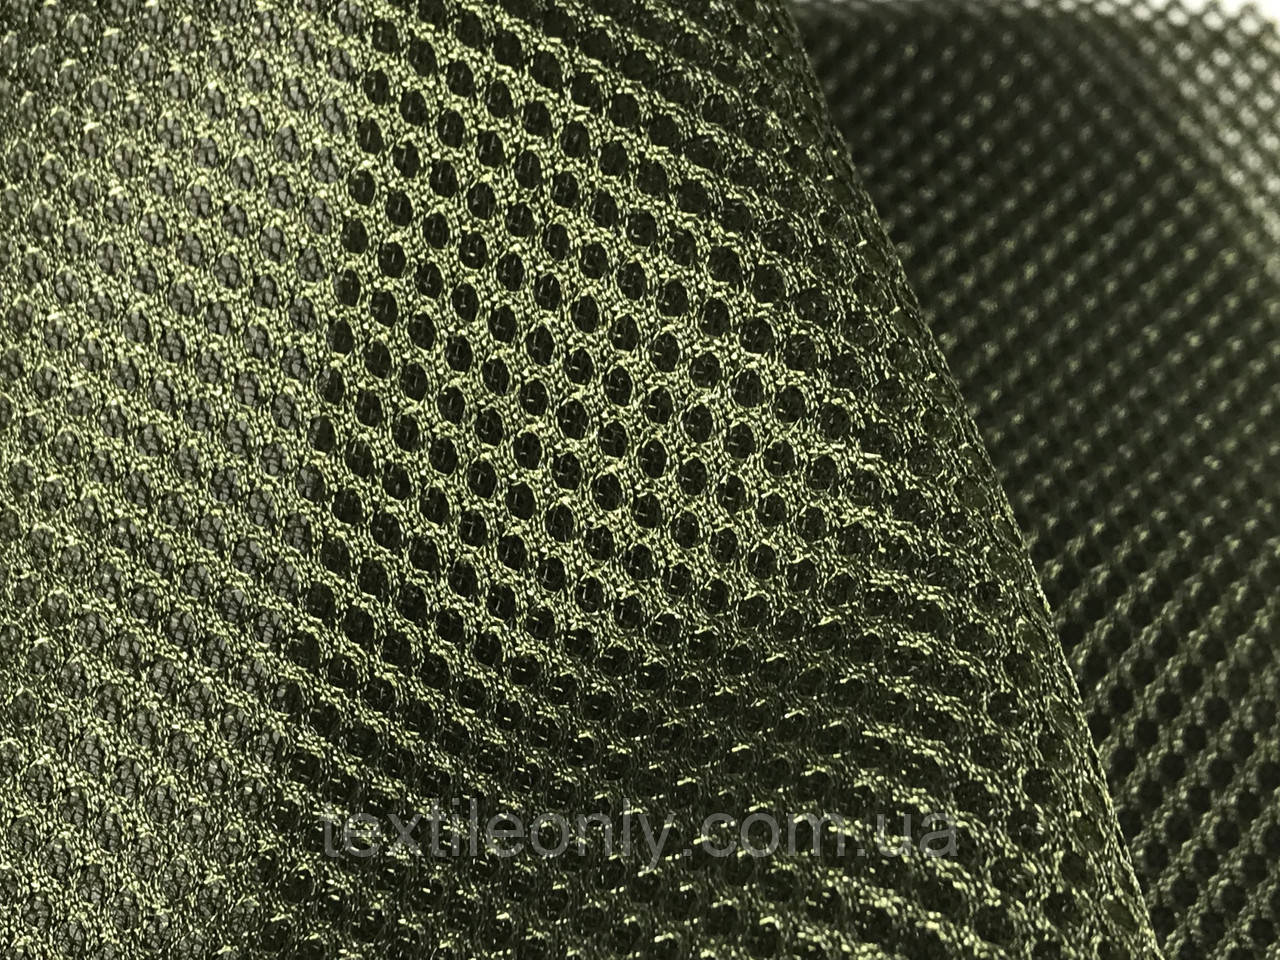 Сетка сумочно-обувная на поролоне артекс (airtex) цвет хаки